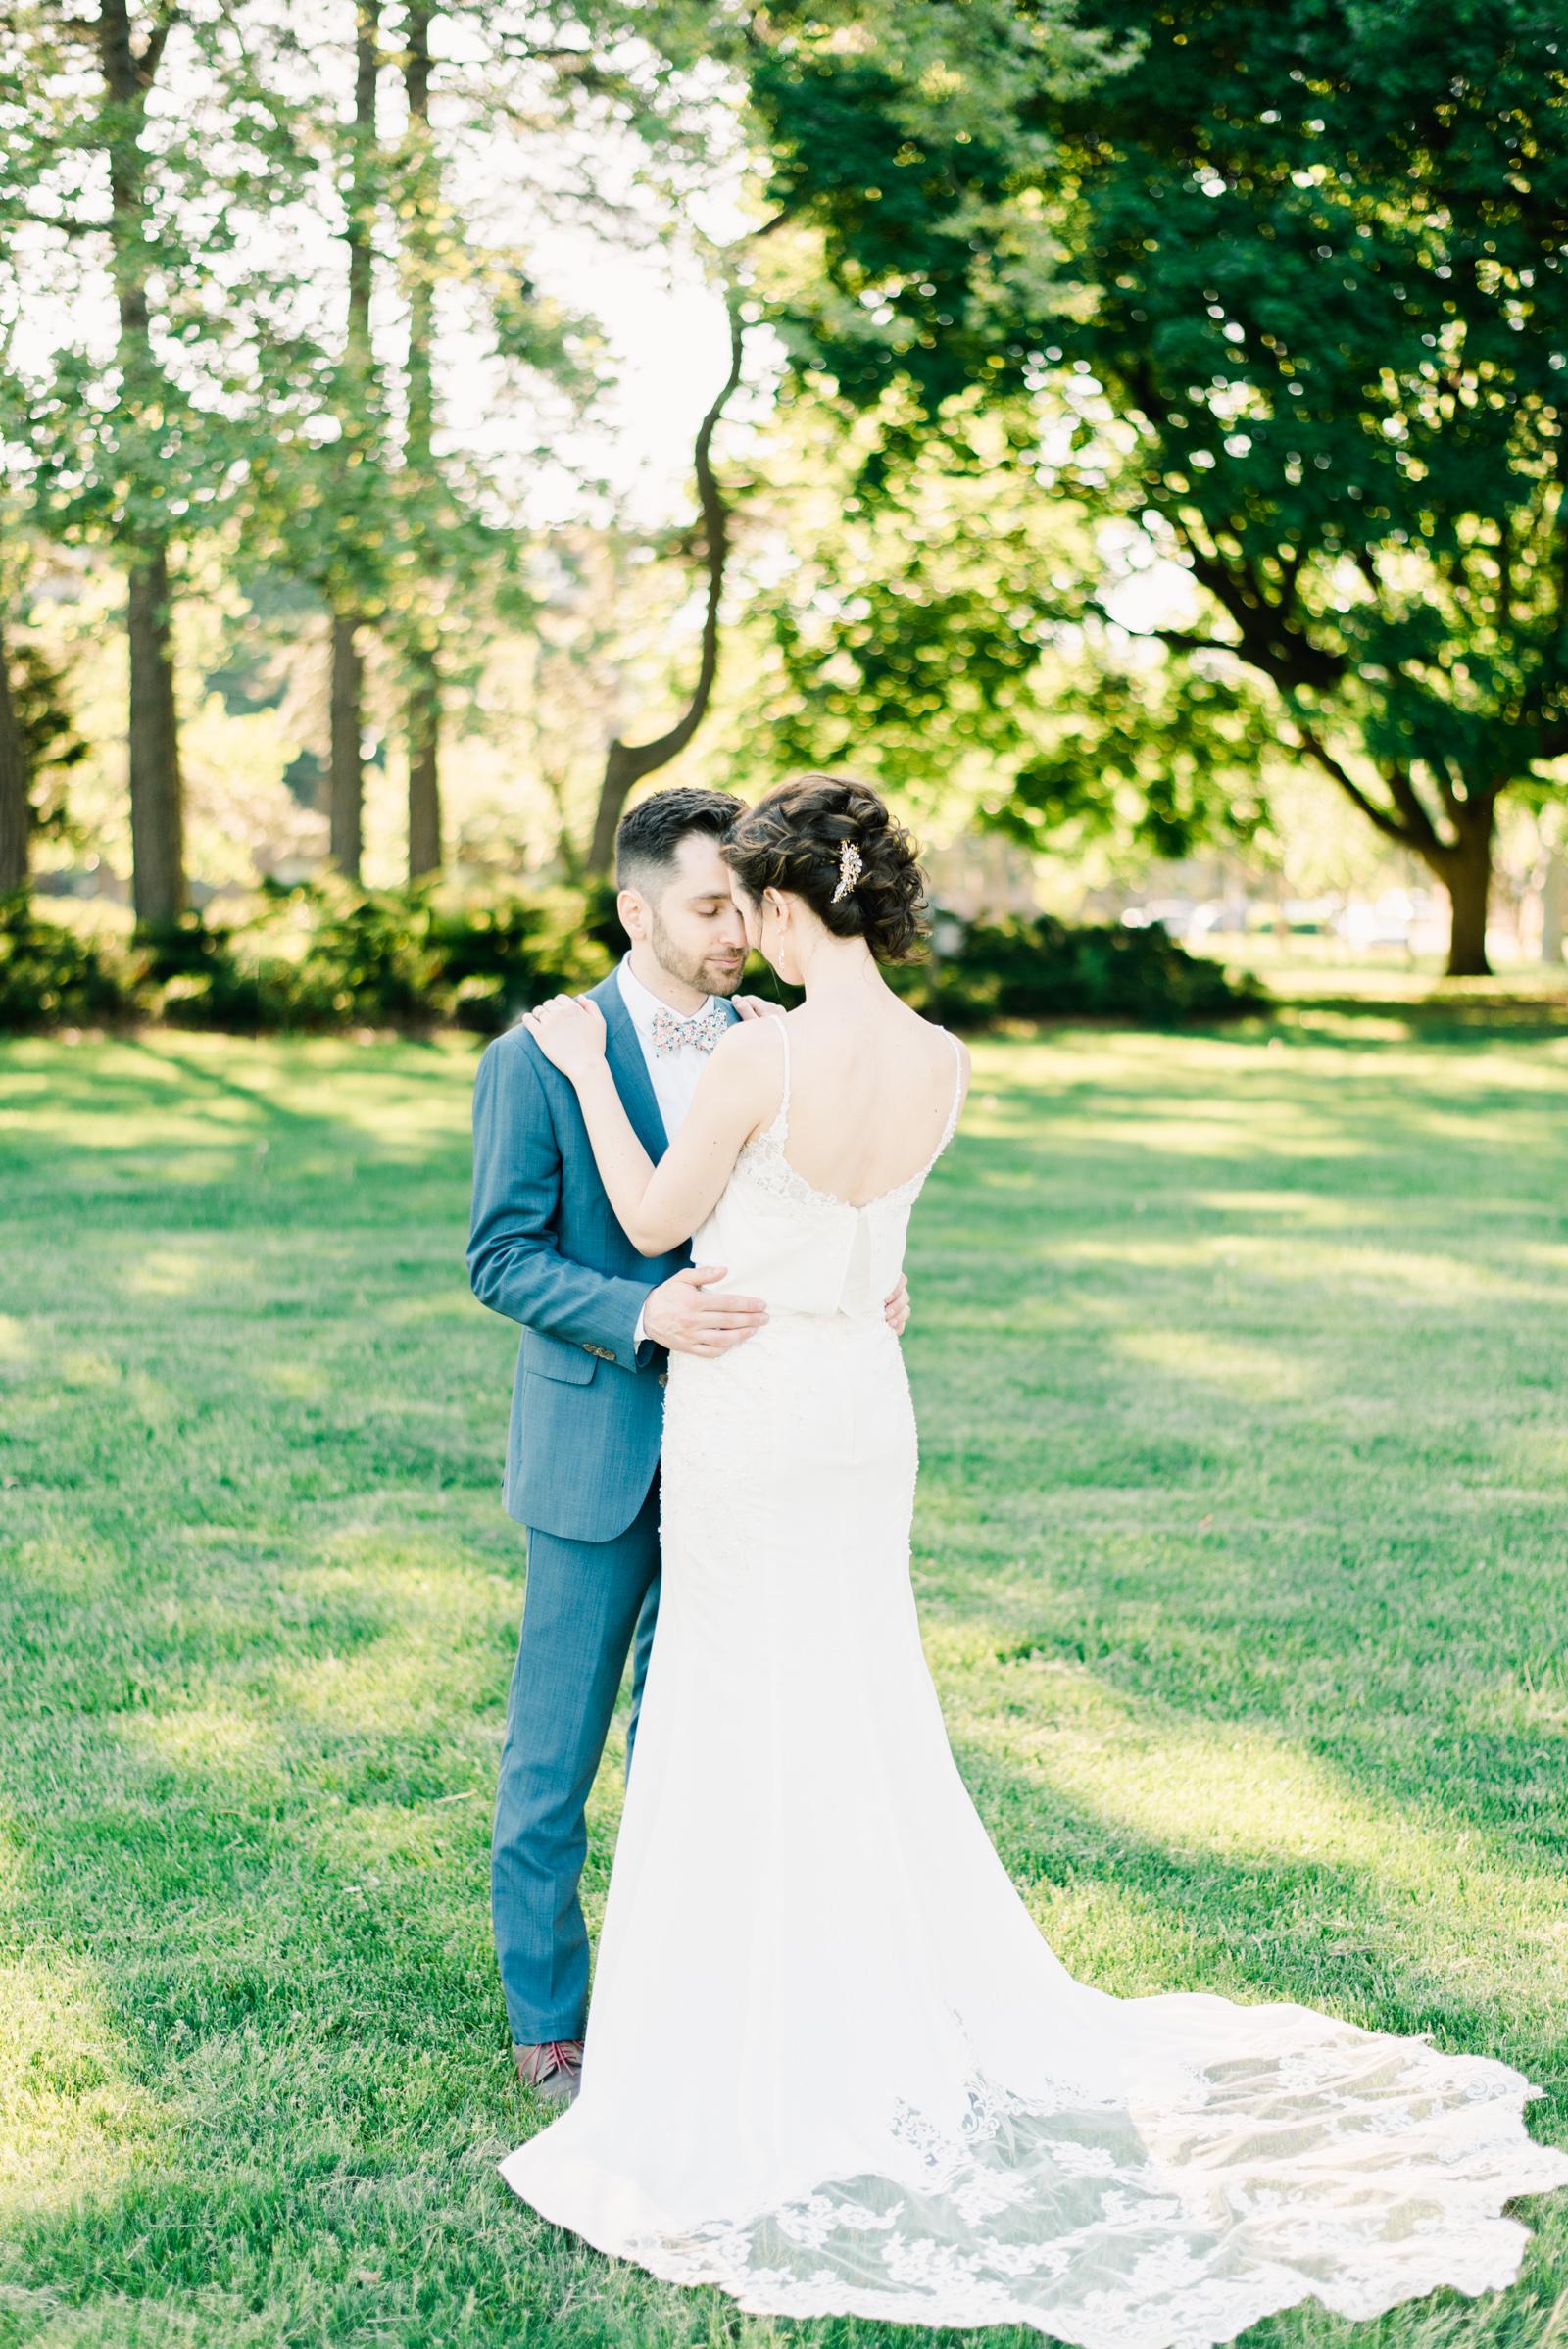 Meghan & Ben - Hamilton Gage Park Wedding -8.jpg